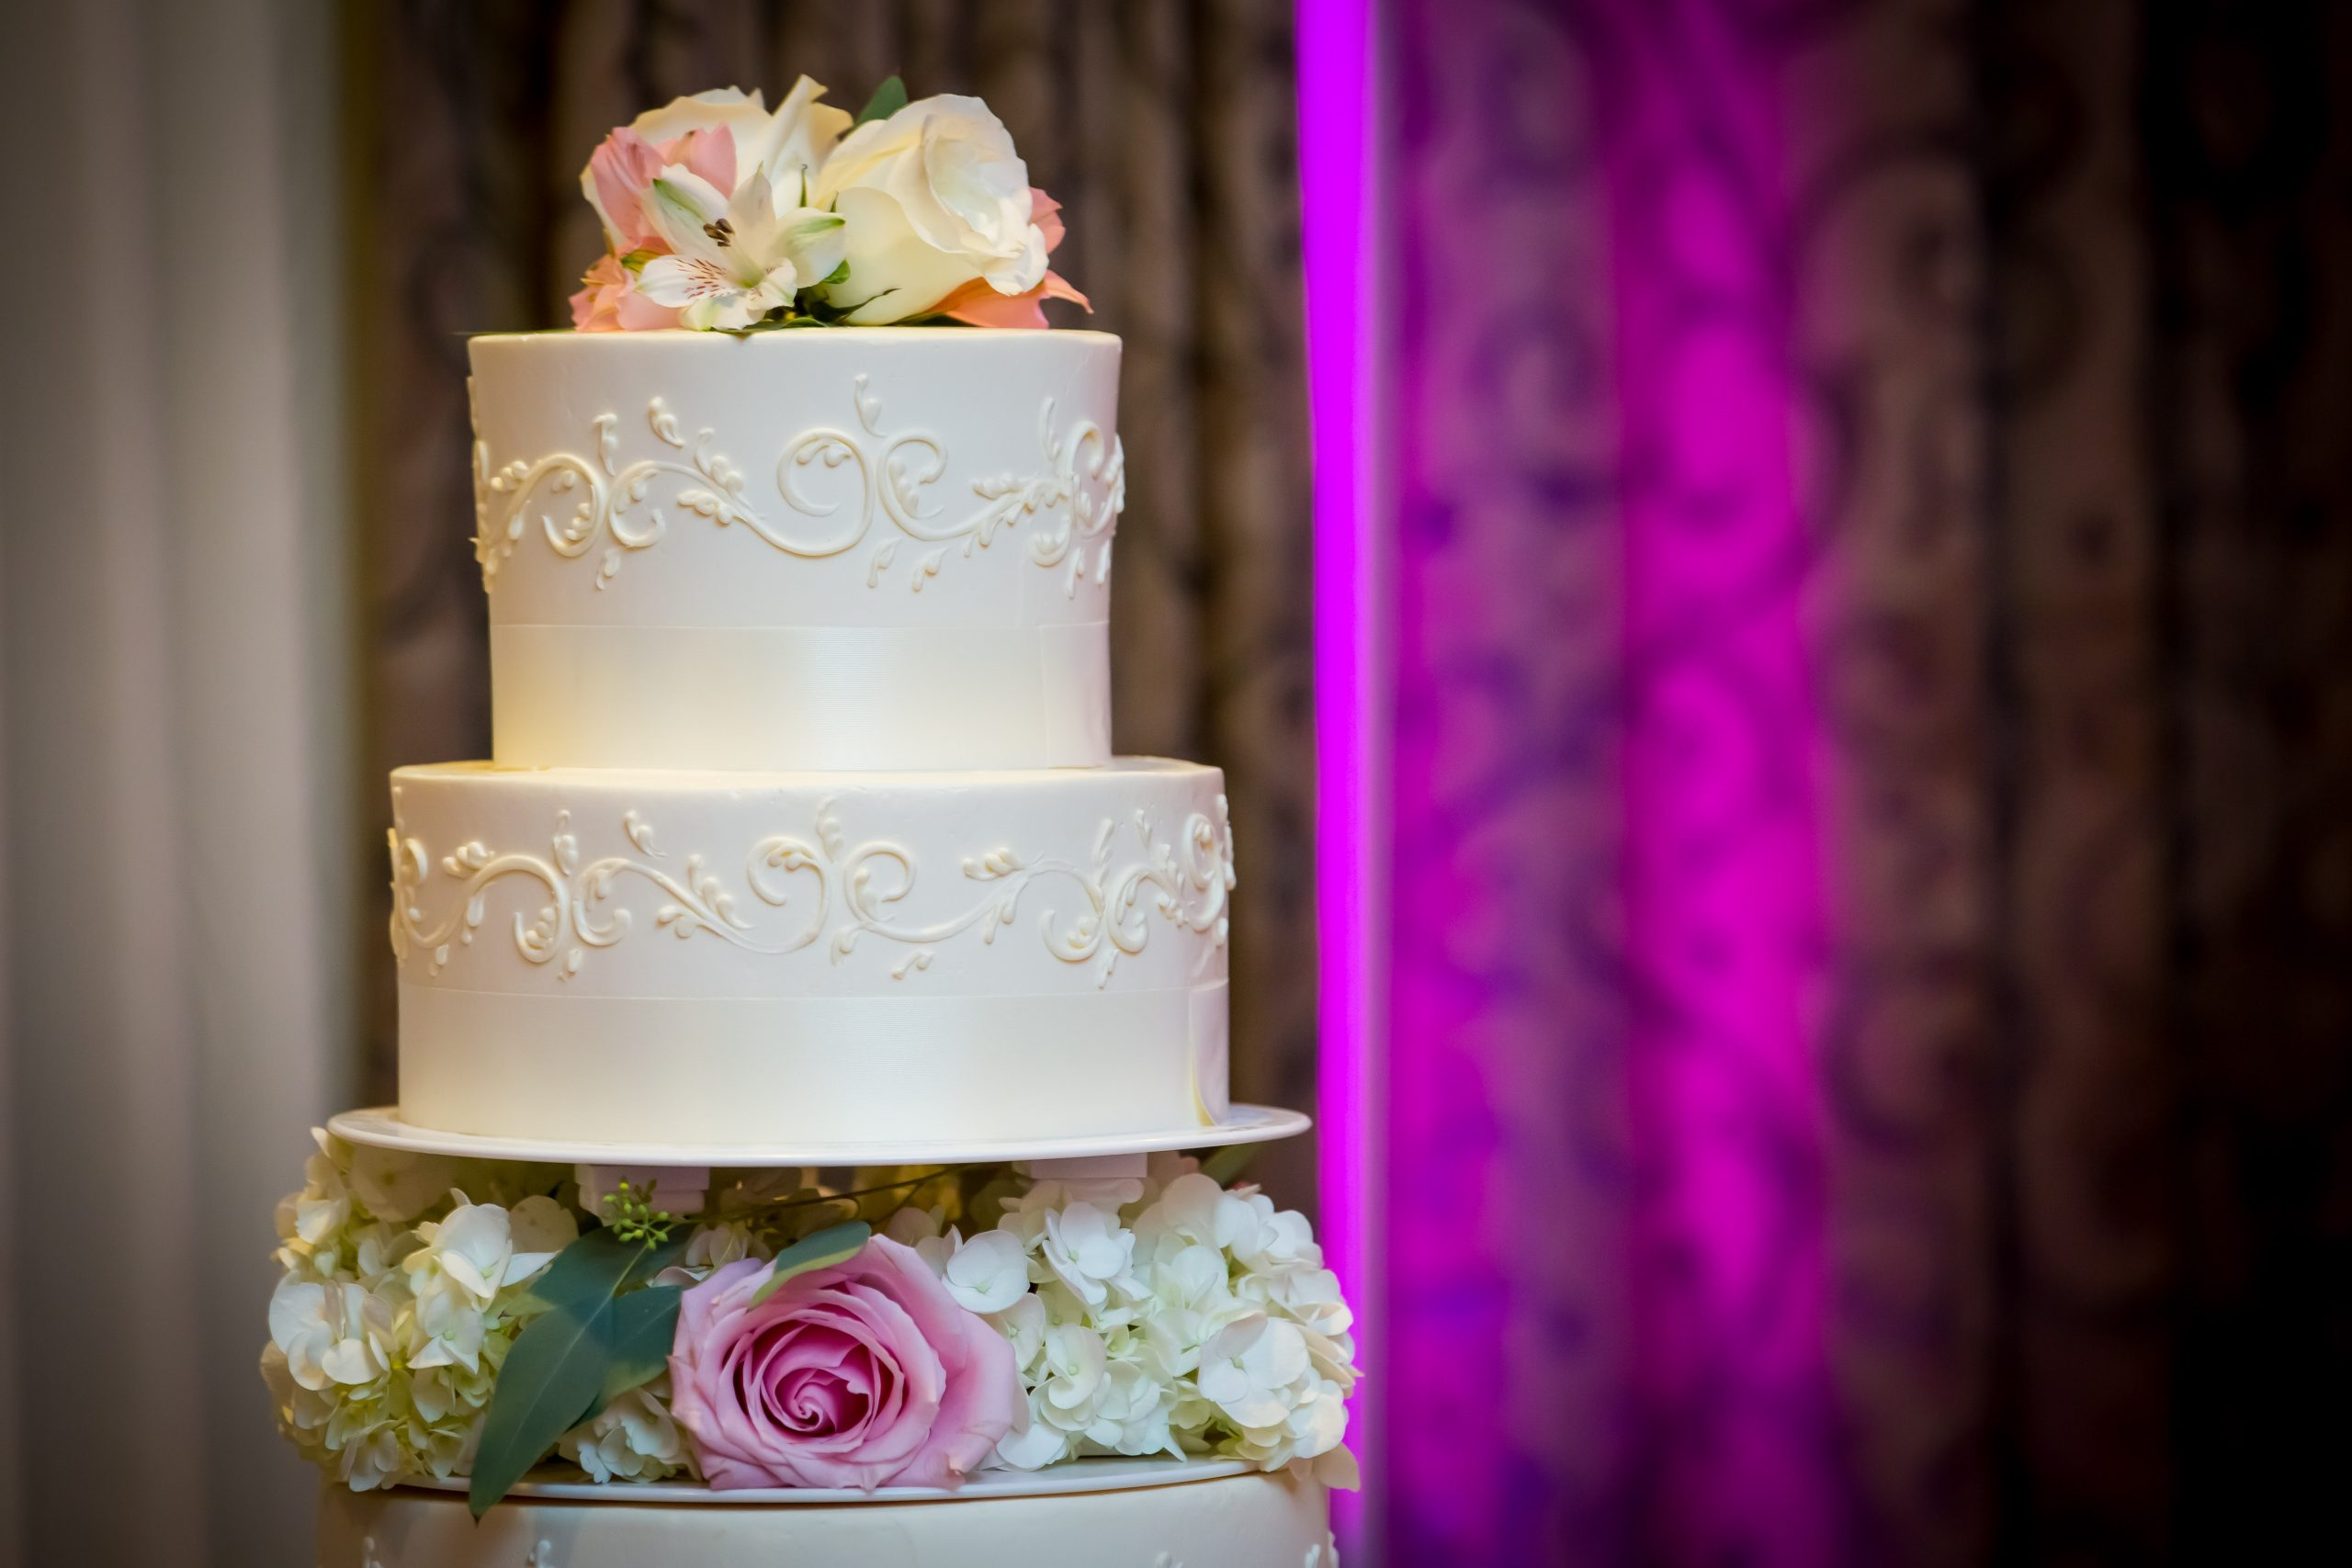 Victori_Rob_Mohawk River Country Club Wedding-55.jpg